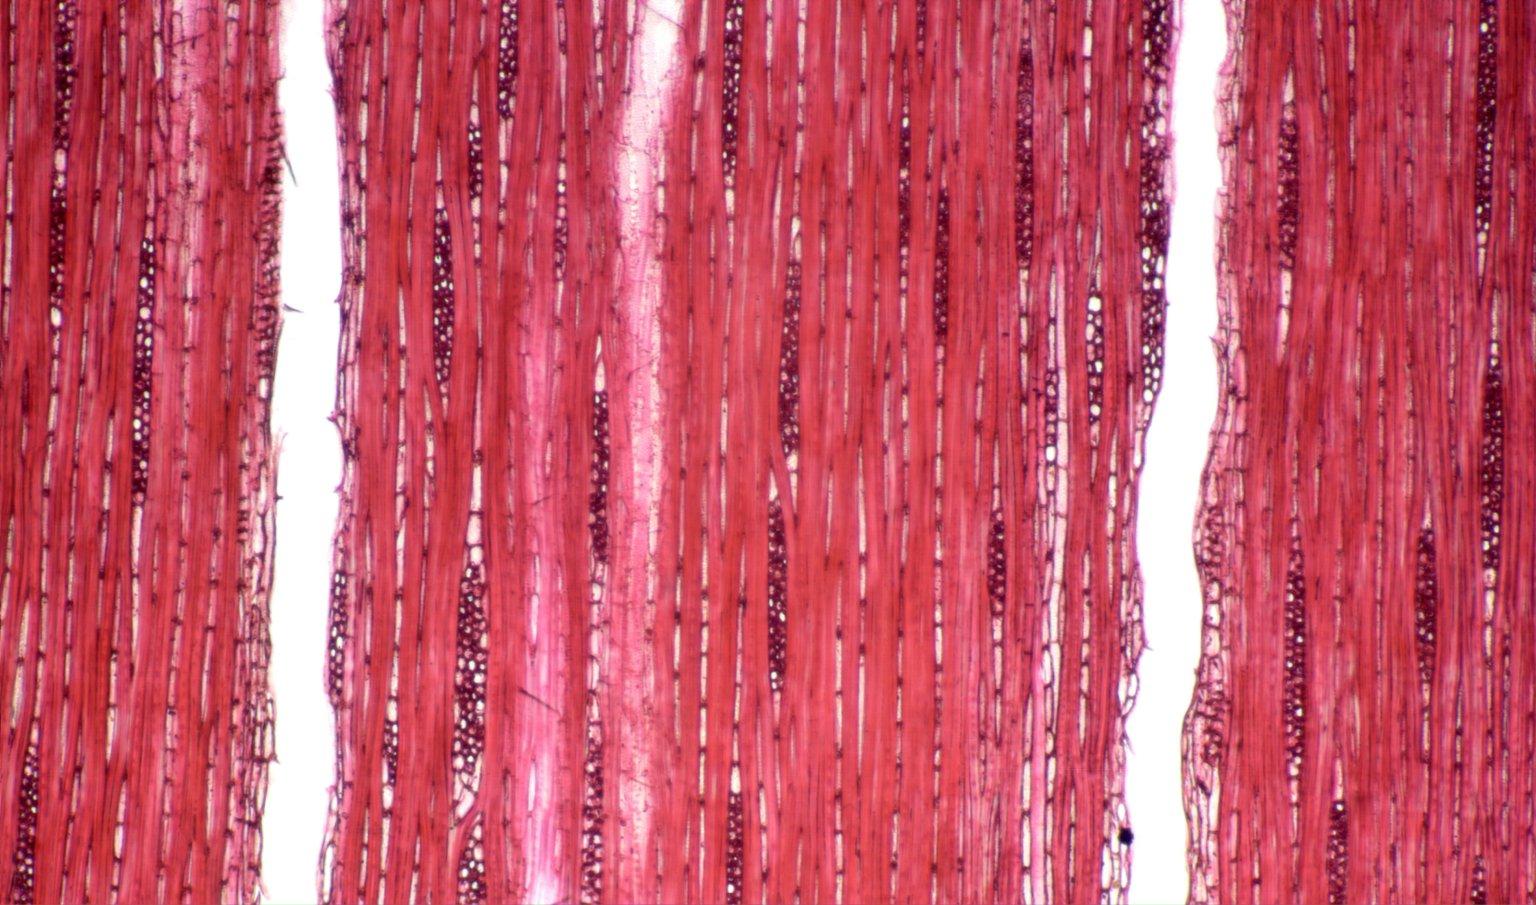 LOGANIACEAE Strychnos erichsonii